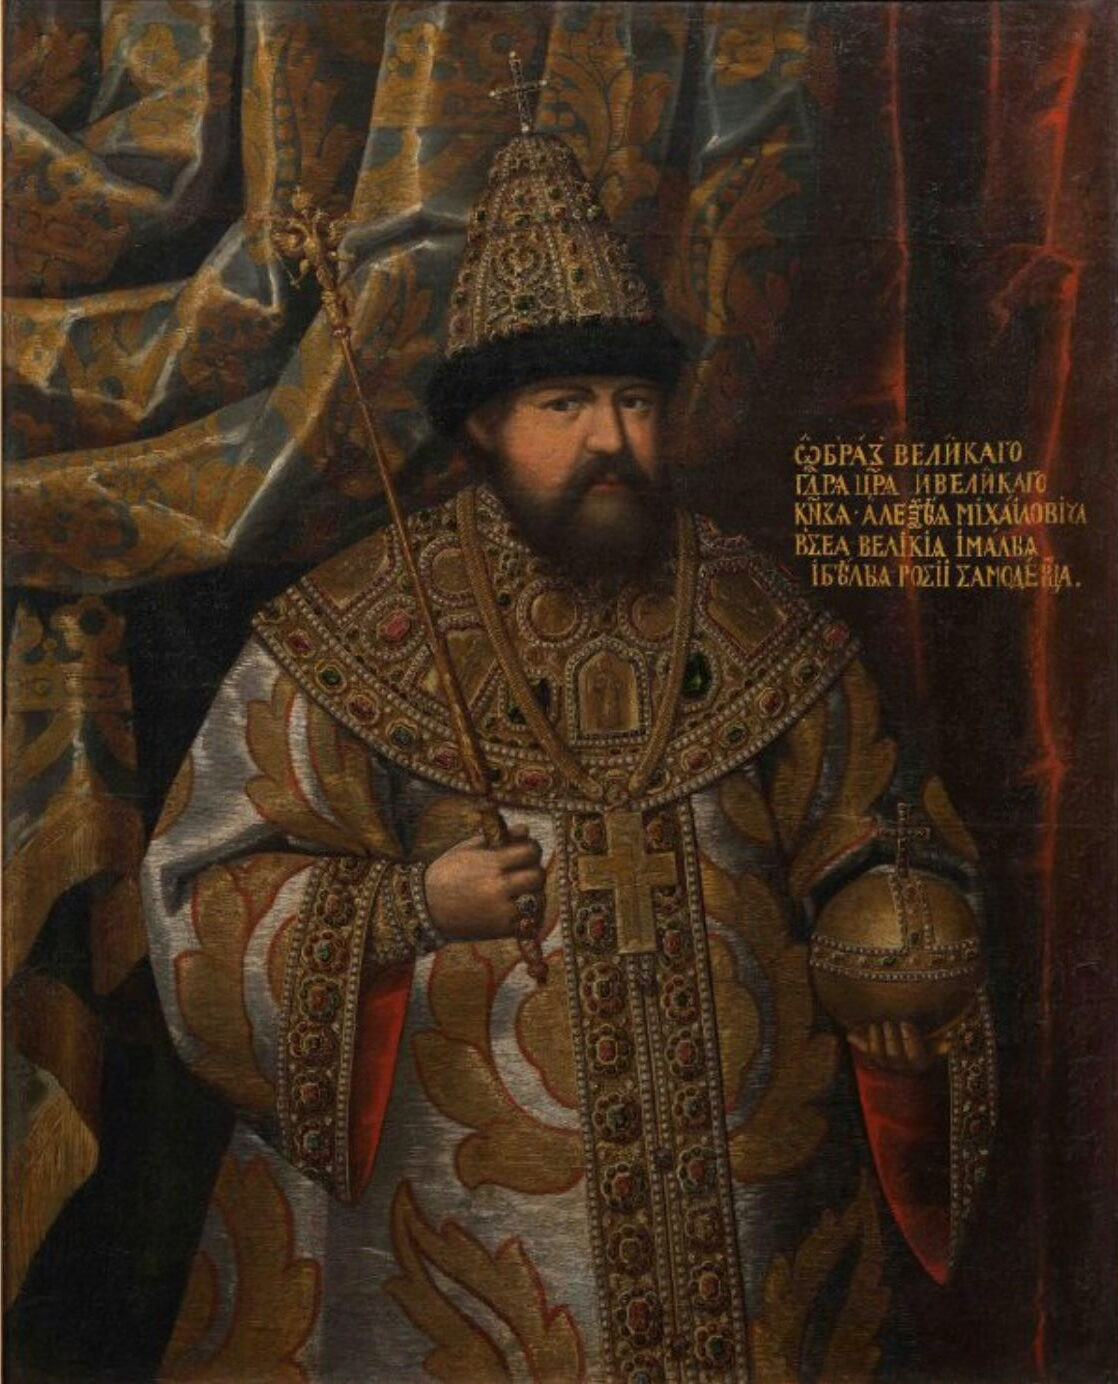 Портрет царя Алексея Михайловича. Неизвестный художник. Конец 1670-х – начало 1680-х гг.